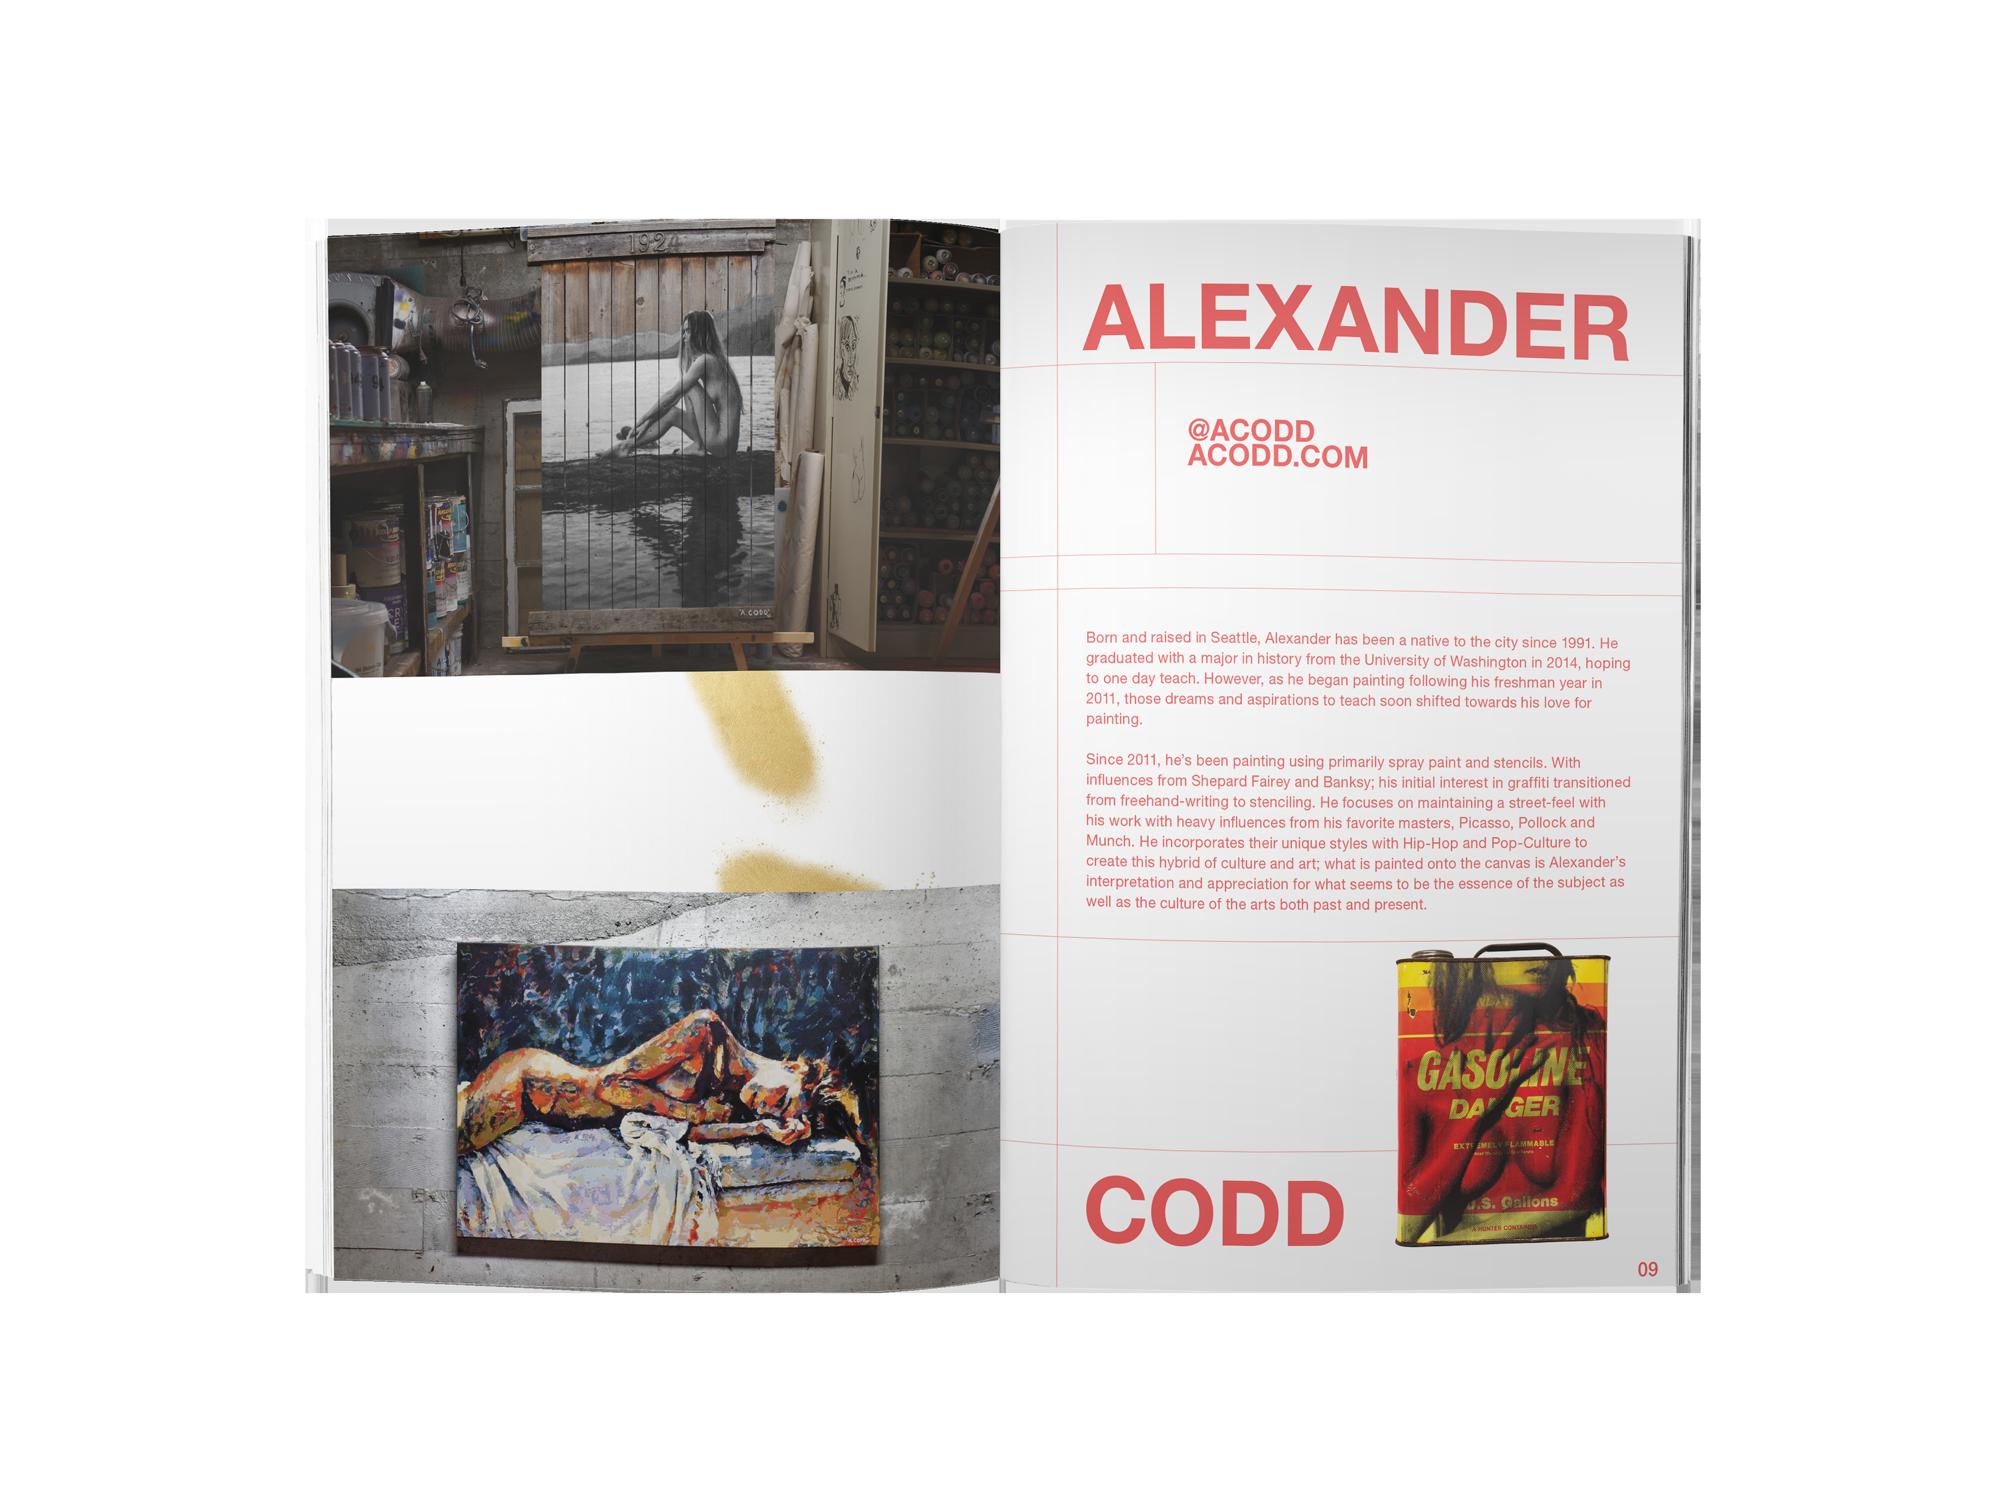 alexander-codd.png